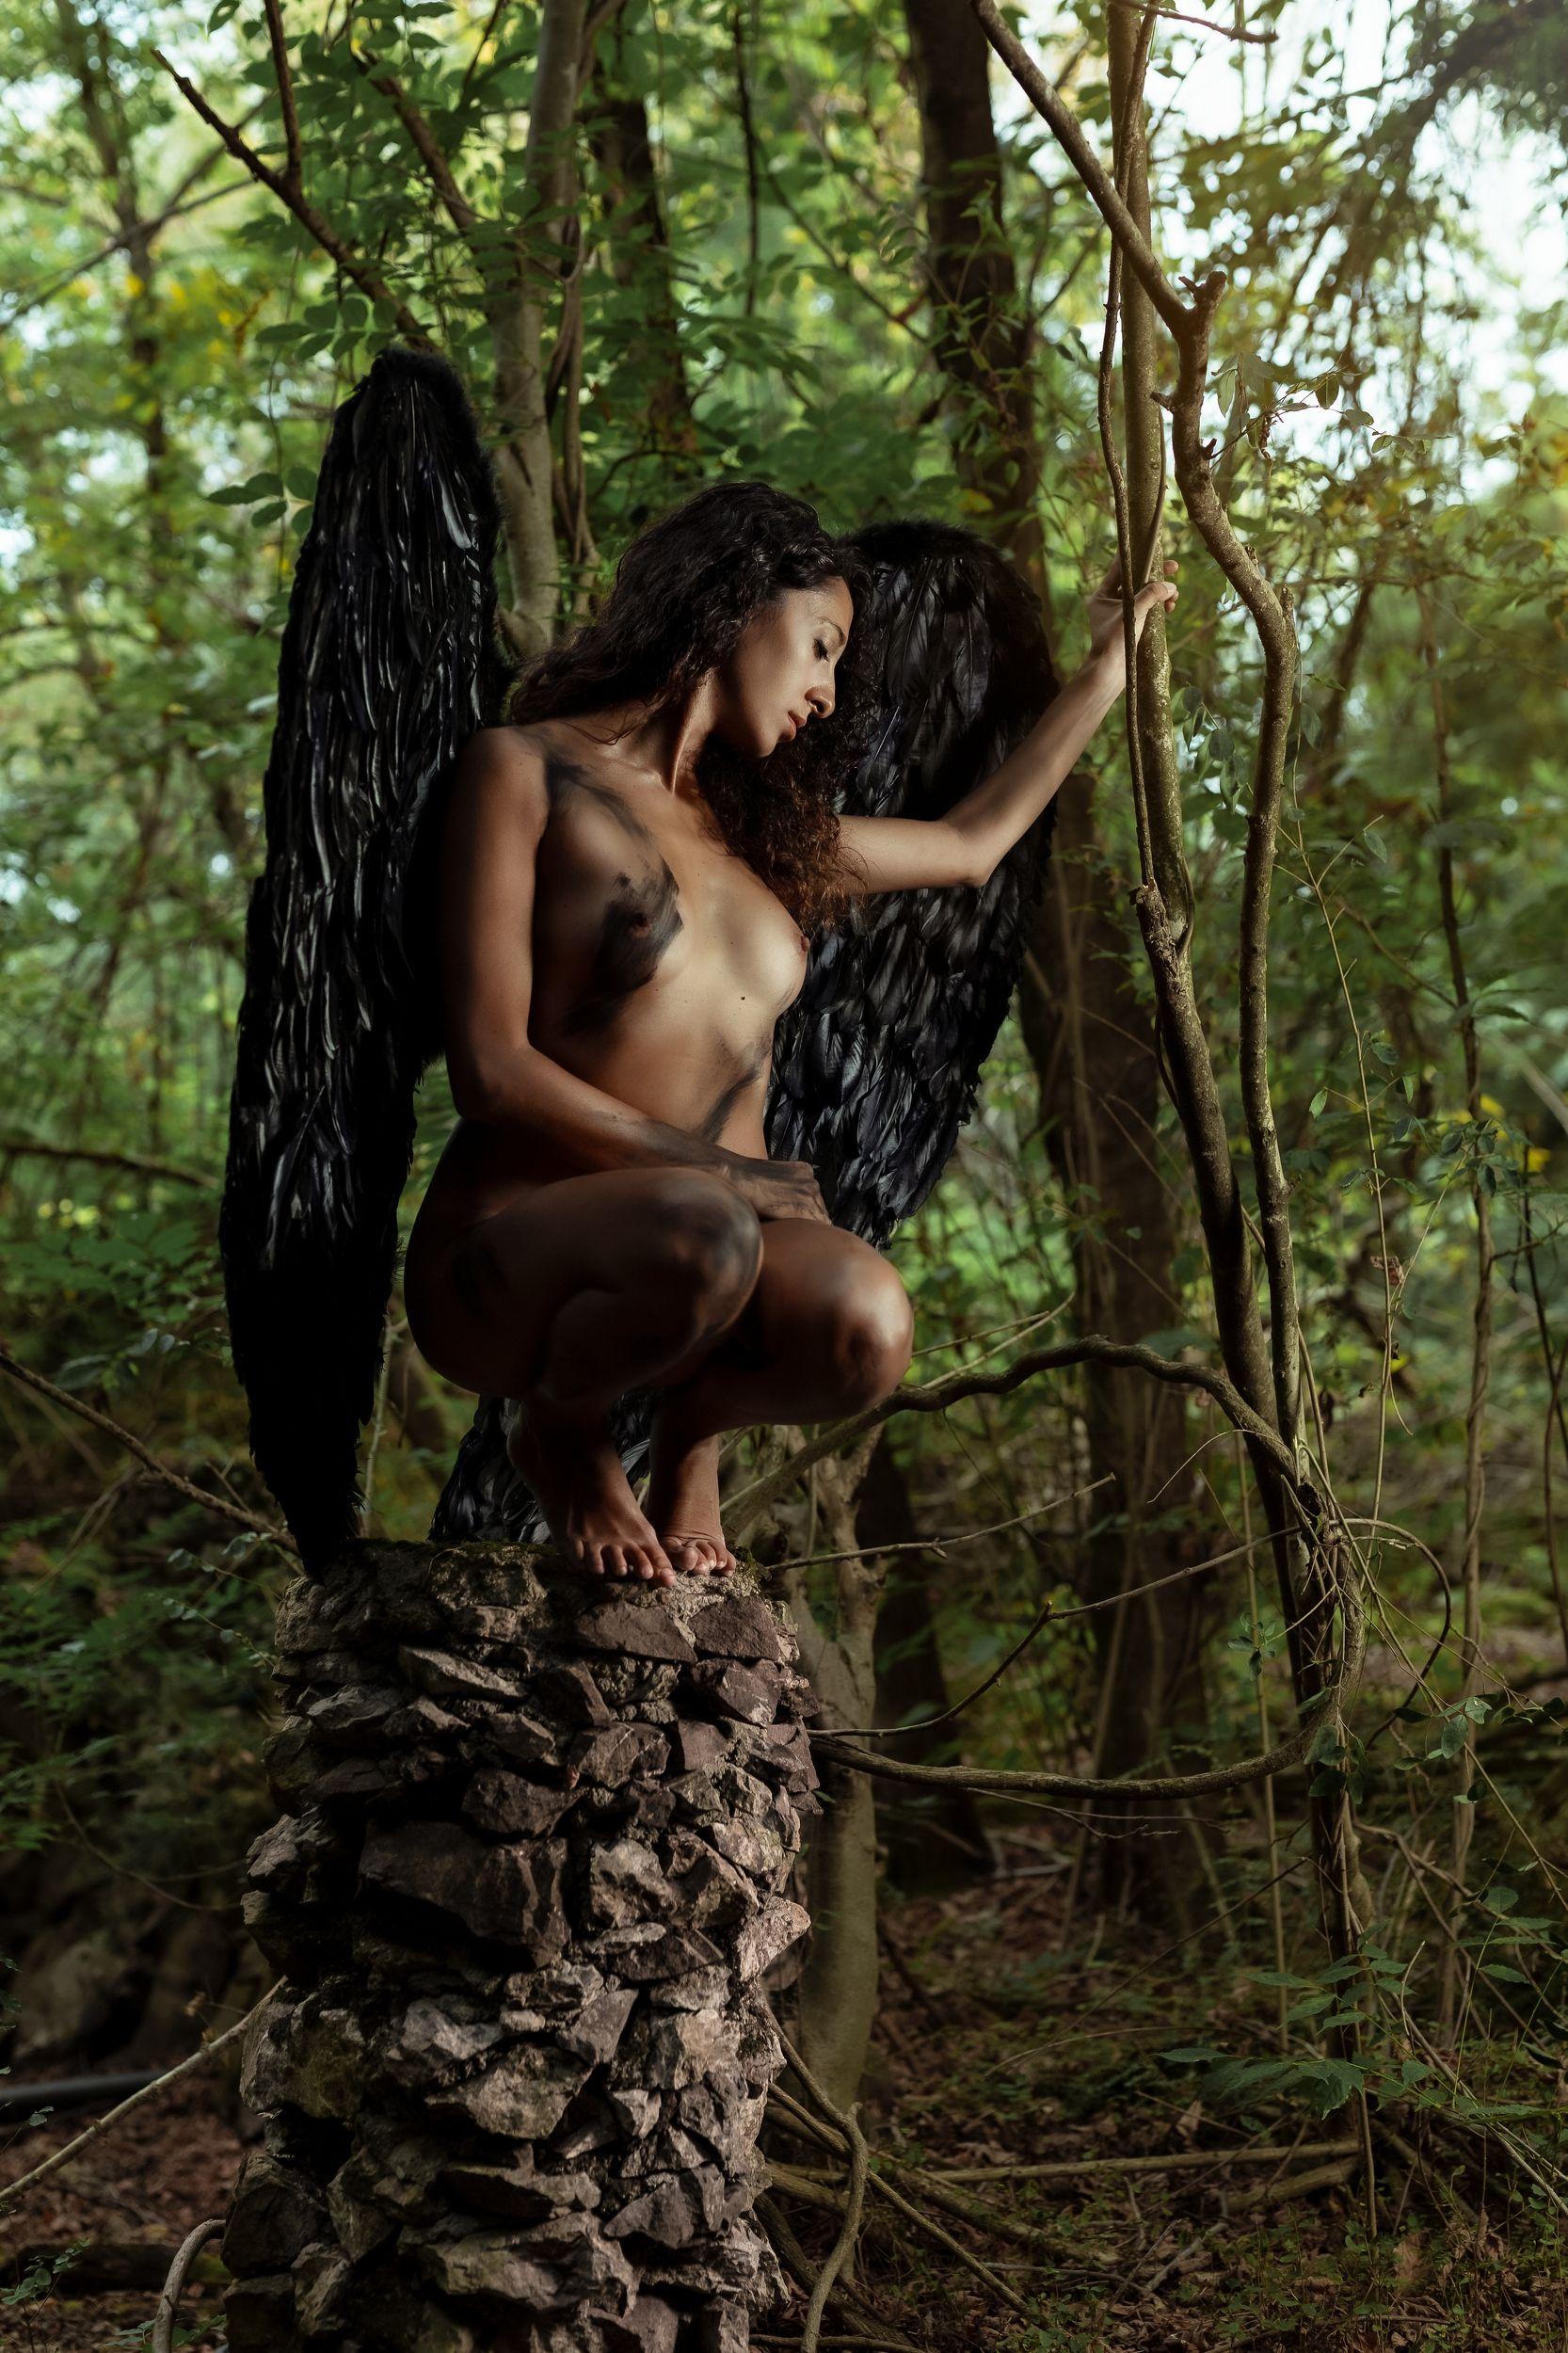 nature, portrait, nude, female, finenude, fineart, espressive photography